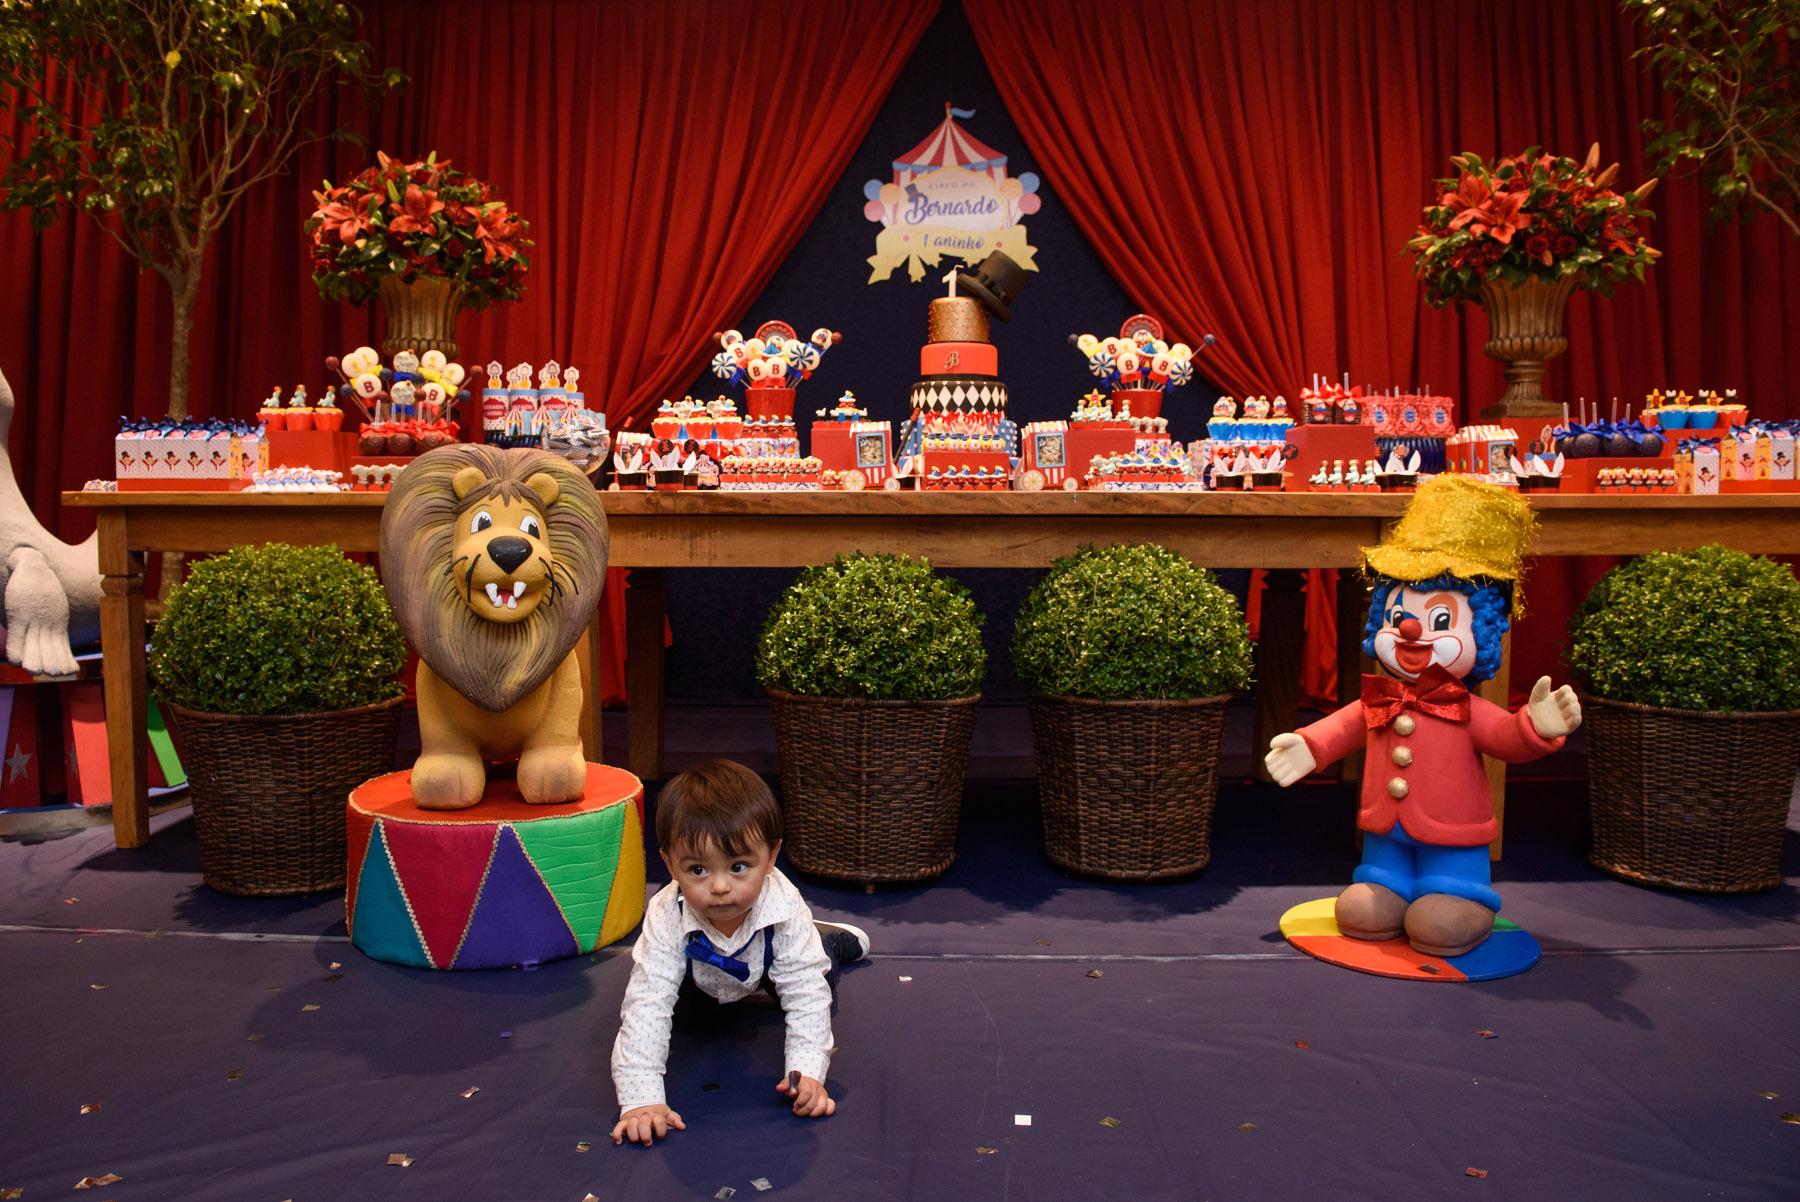 11-festa-infantil-curitiba-mundokids-festade1ano-tema-circo-guswanderley.jpg